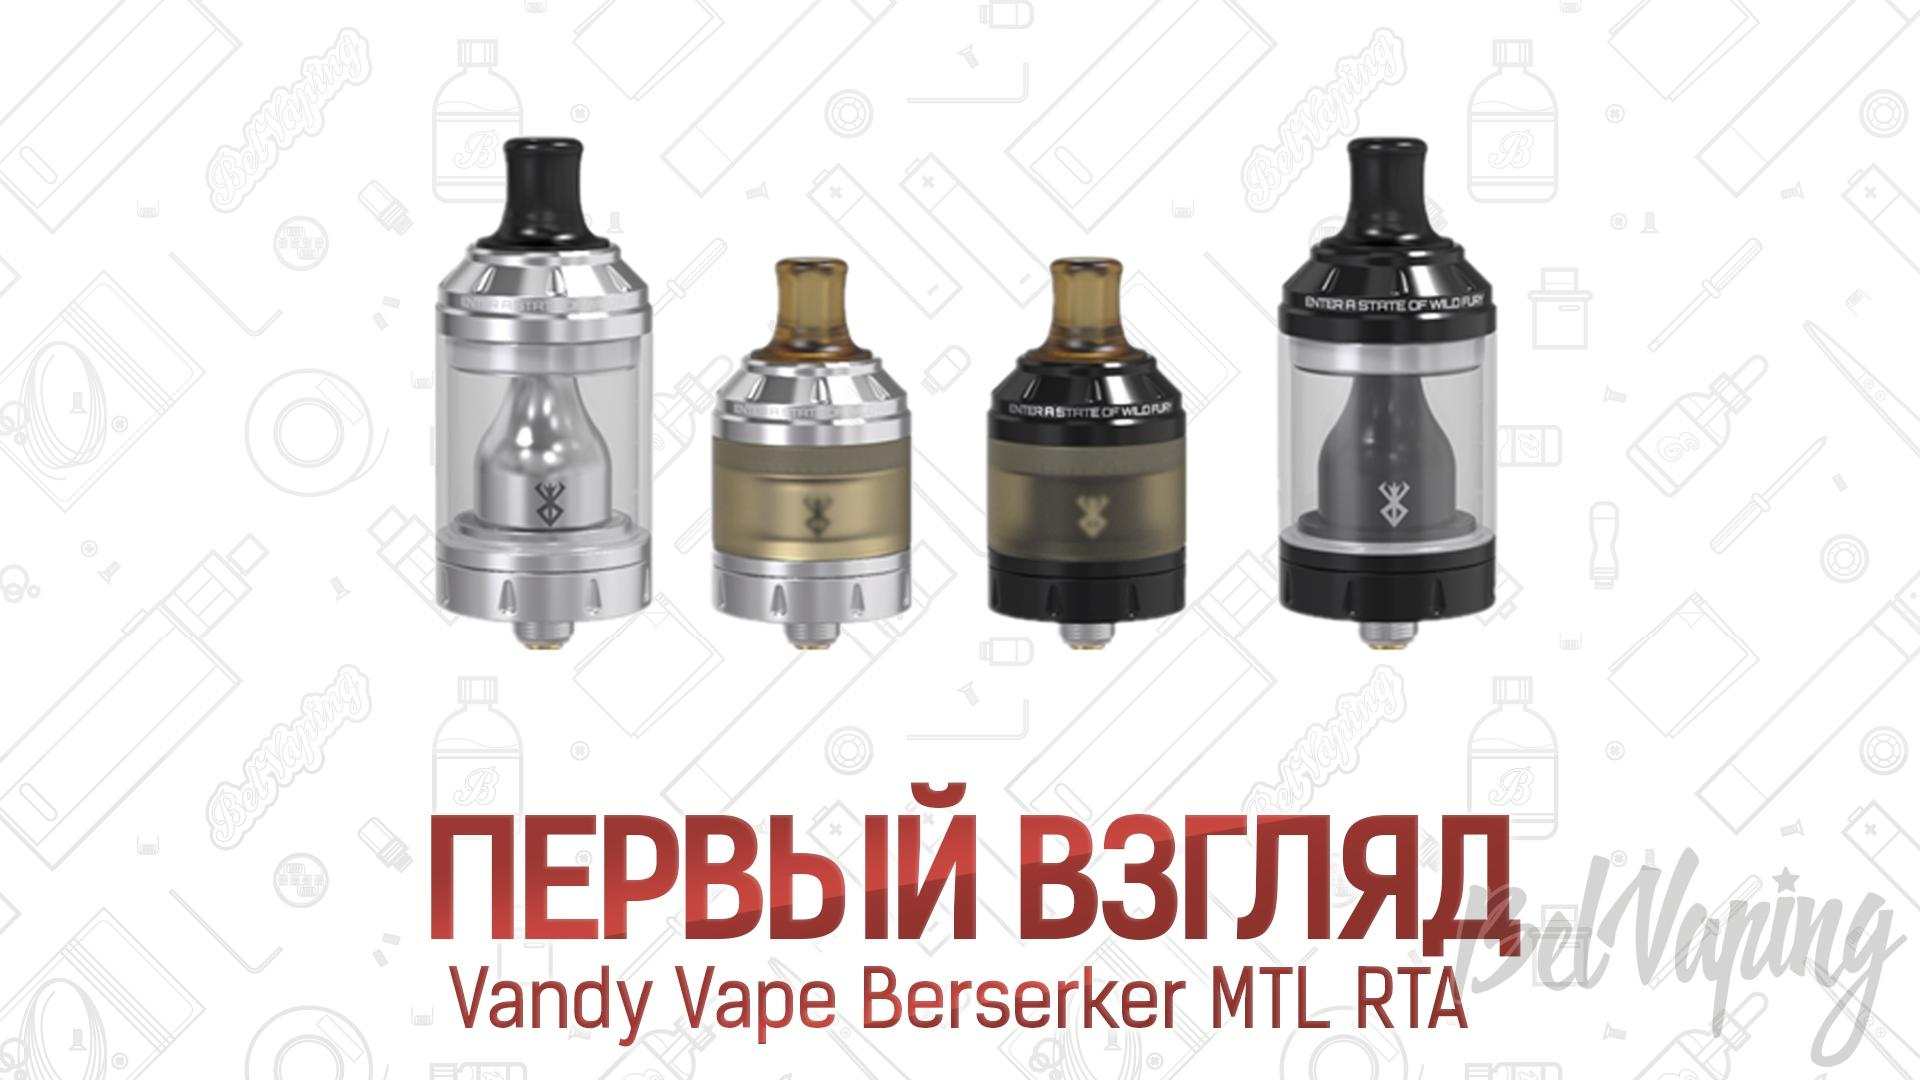 Vandy Vape Berserker MTL RTA. Первый взгляд